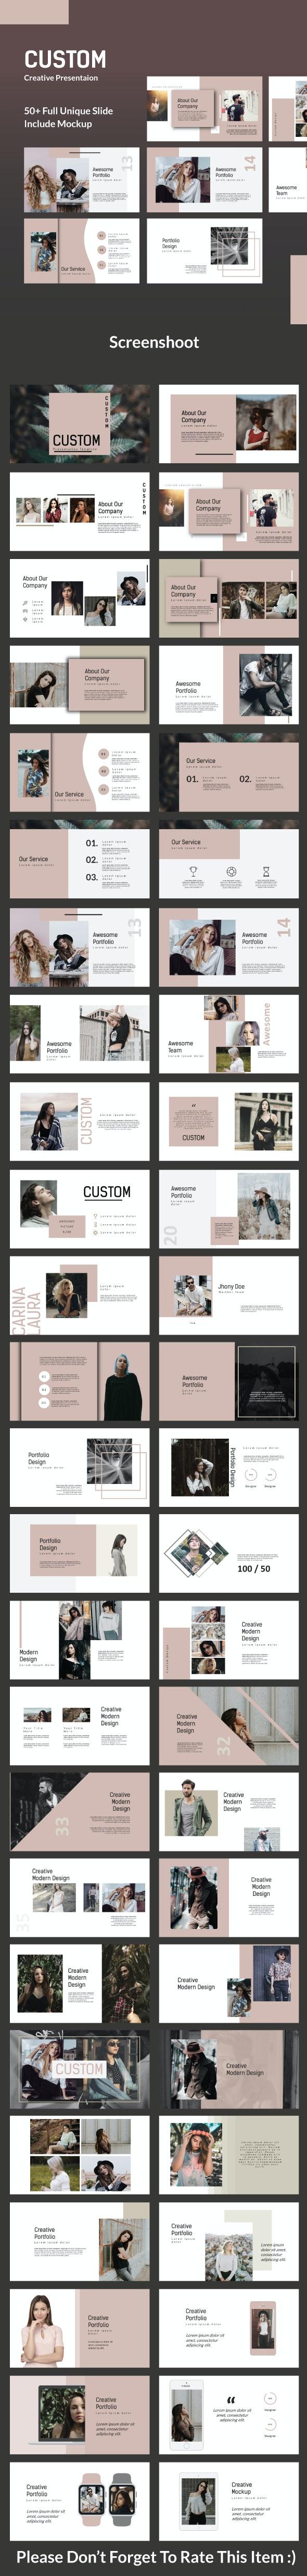 Custom Creative - Keynote Template - Keynote Templates Presentation Templates